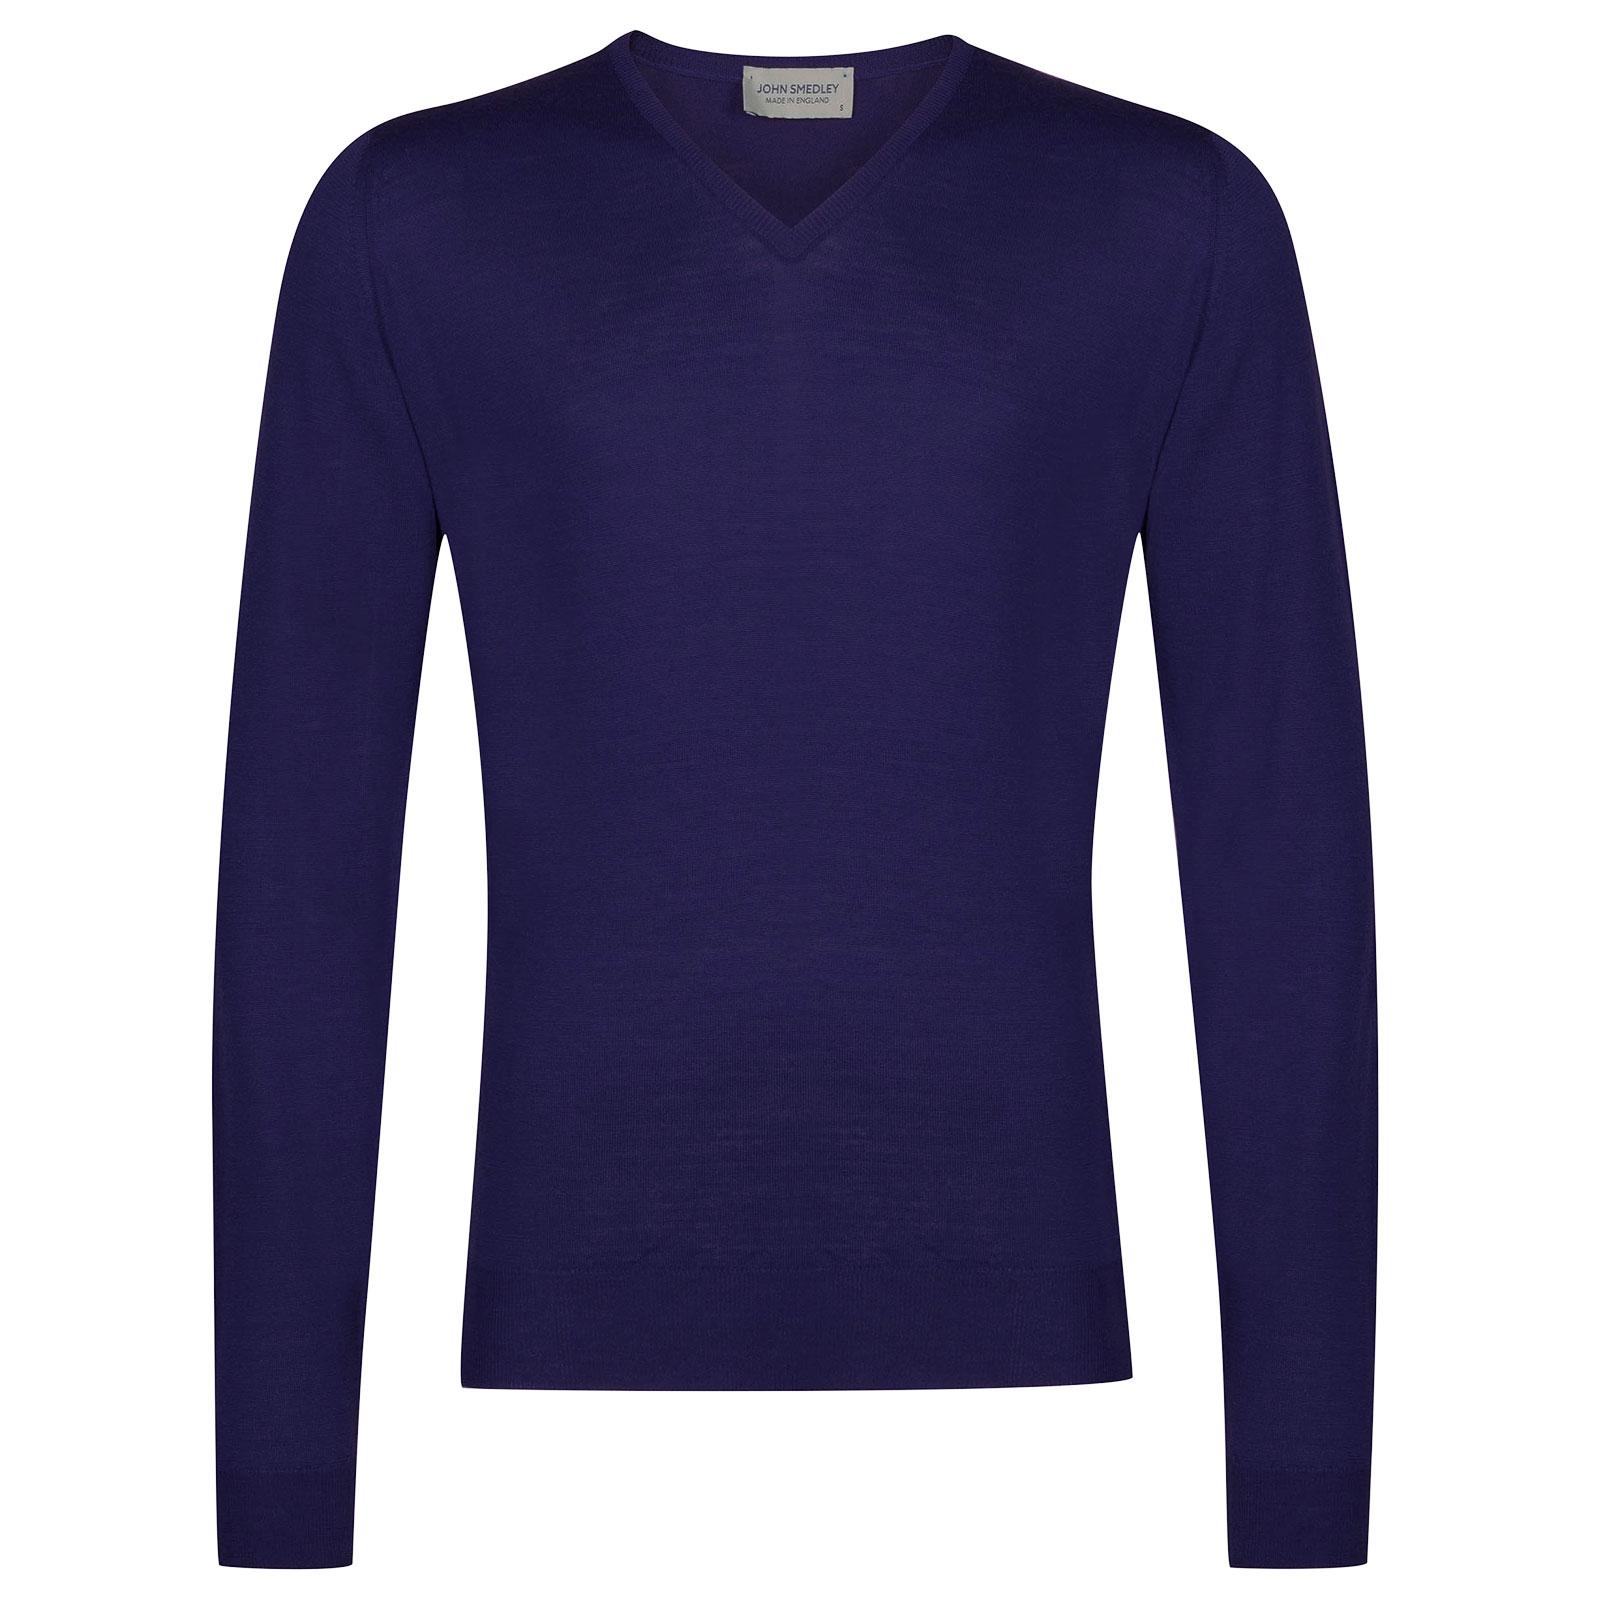 John Smedley Blenheim Merino Wool Pullover in Serge Blue-L